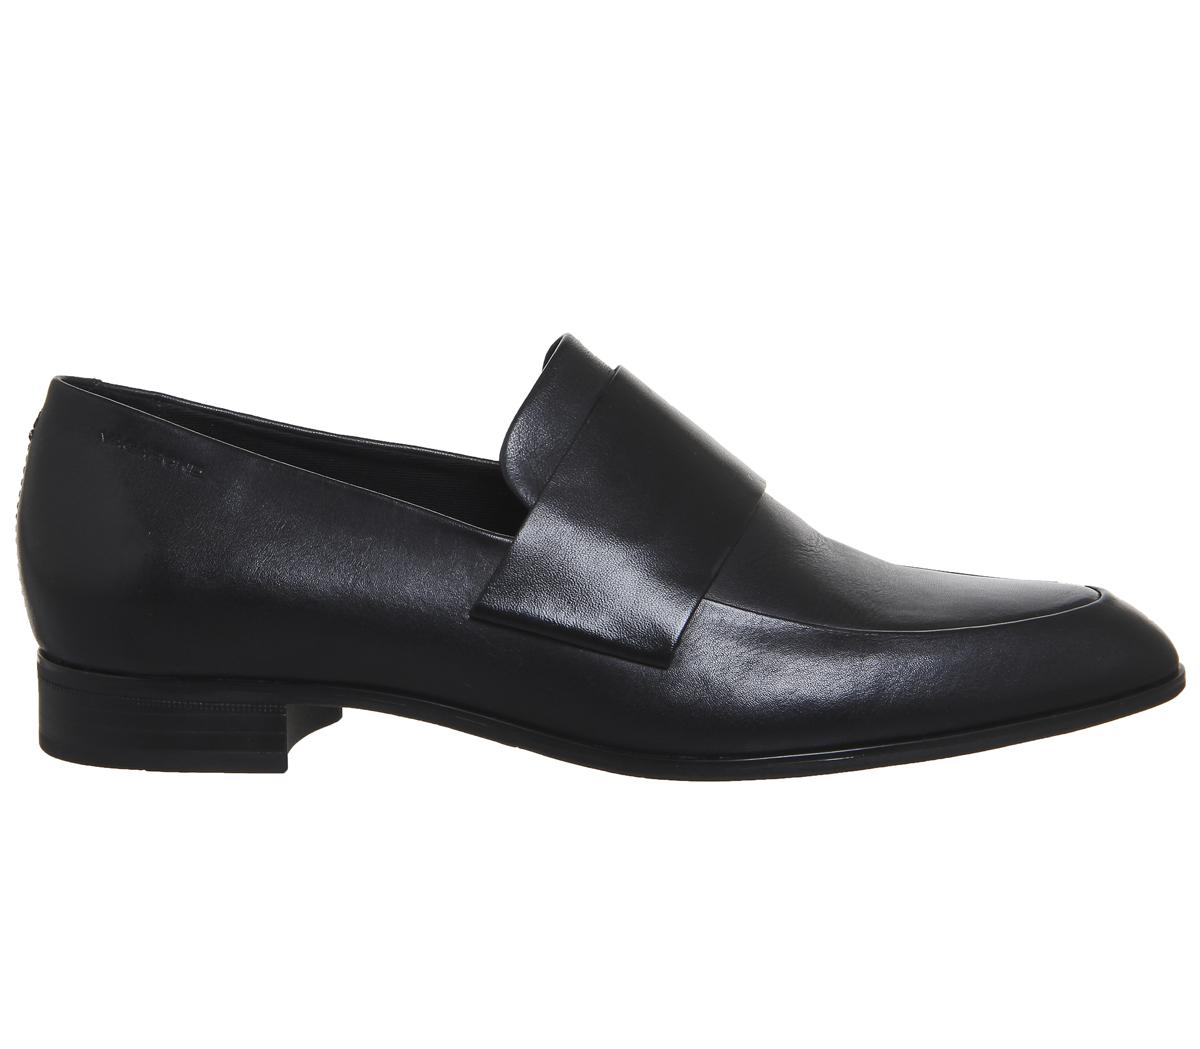 Womens Frances Leather Slip On Loafer Black Vagabond Many Styles Free Shipping Online dbG5ed8Bj